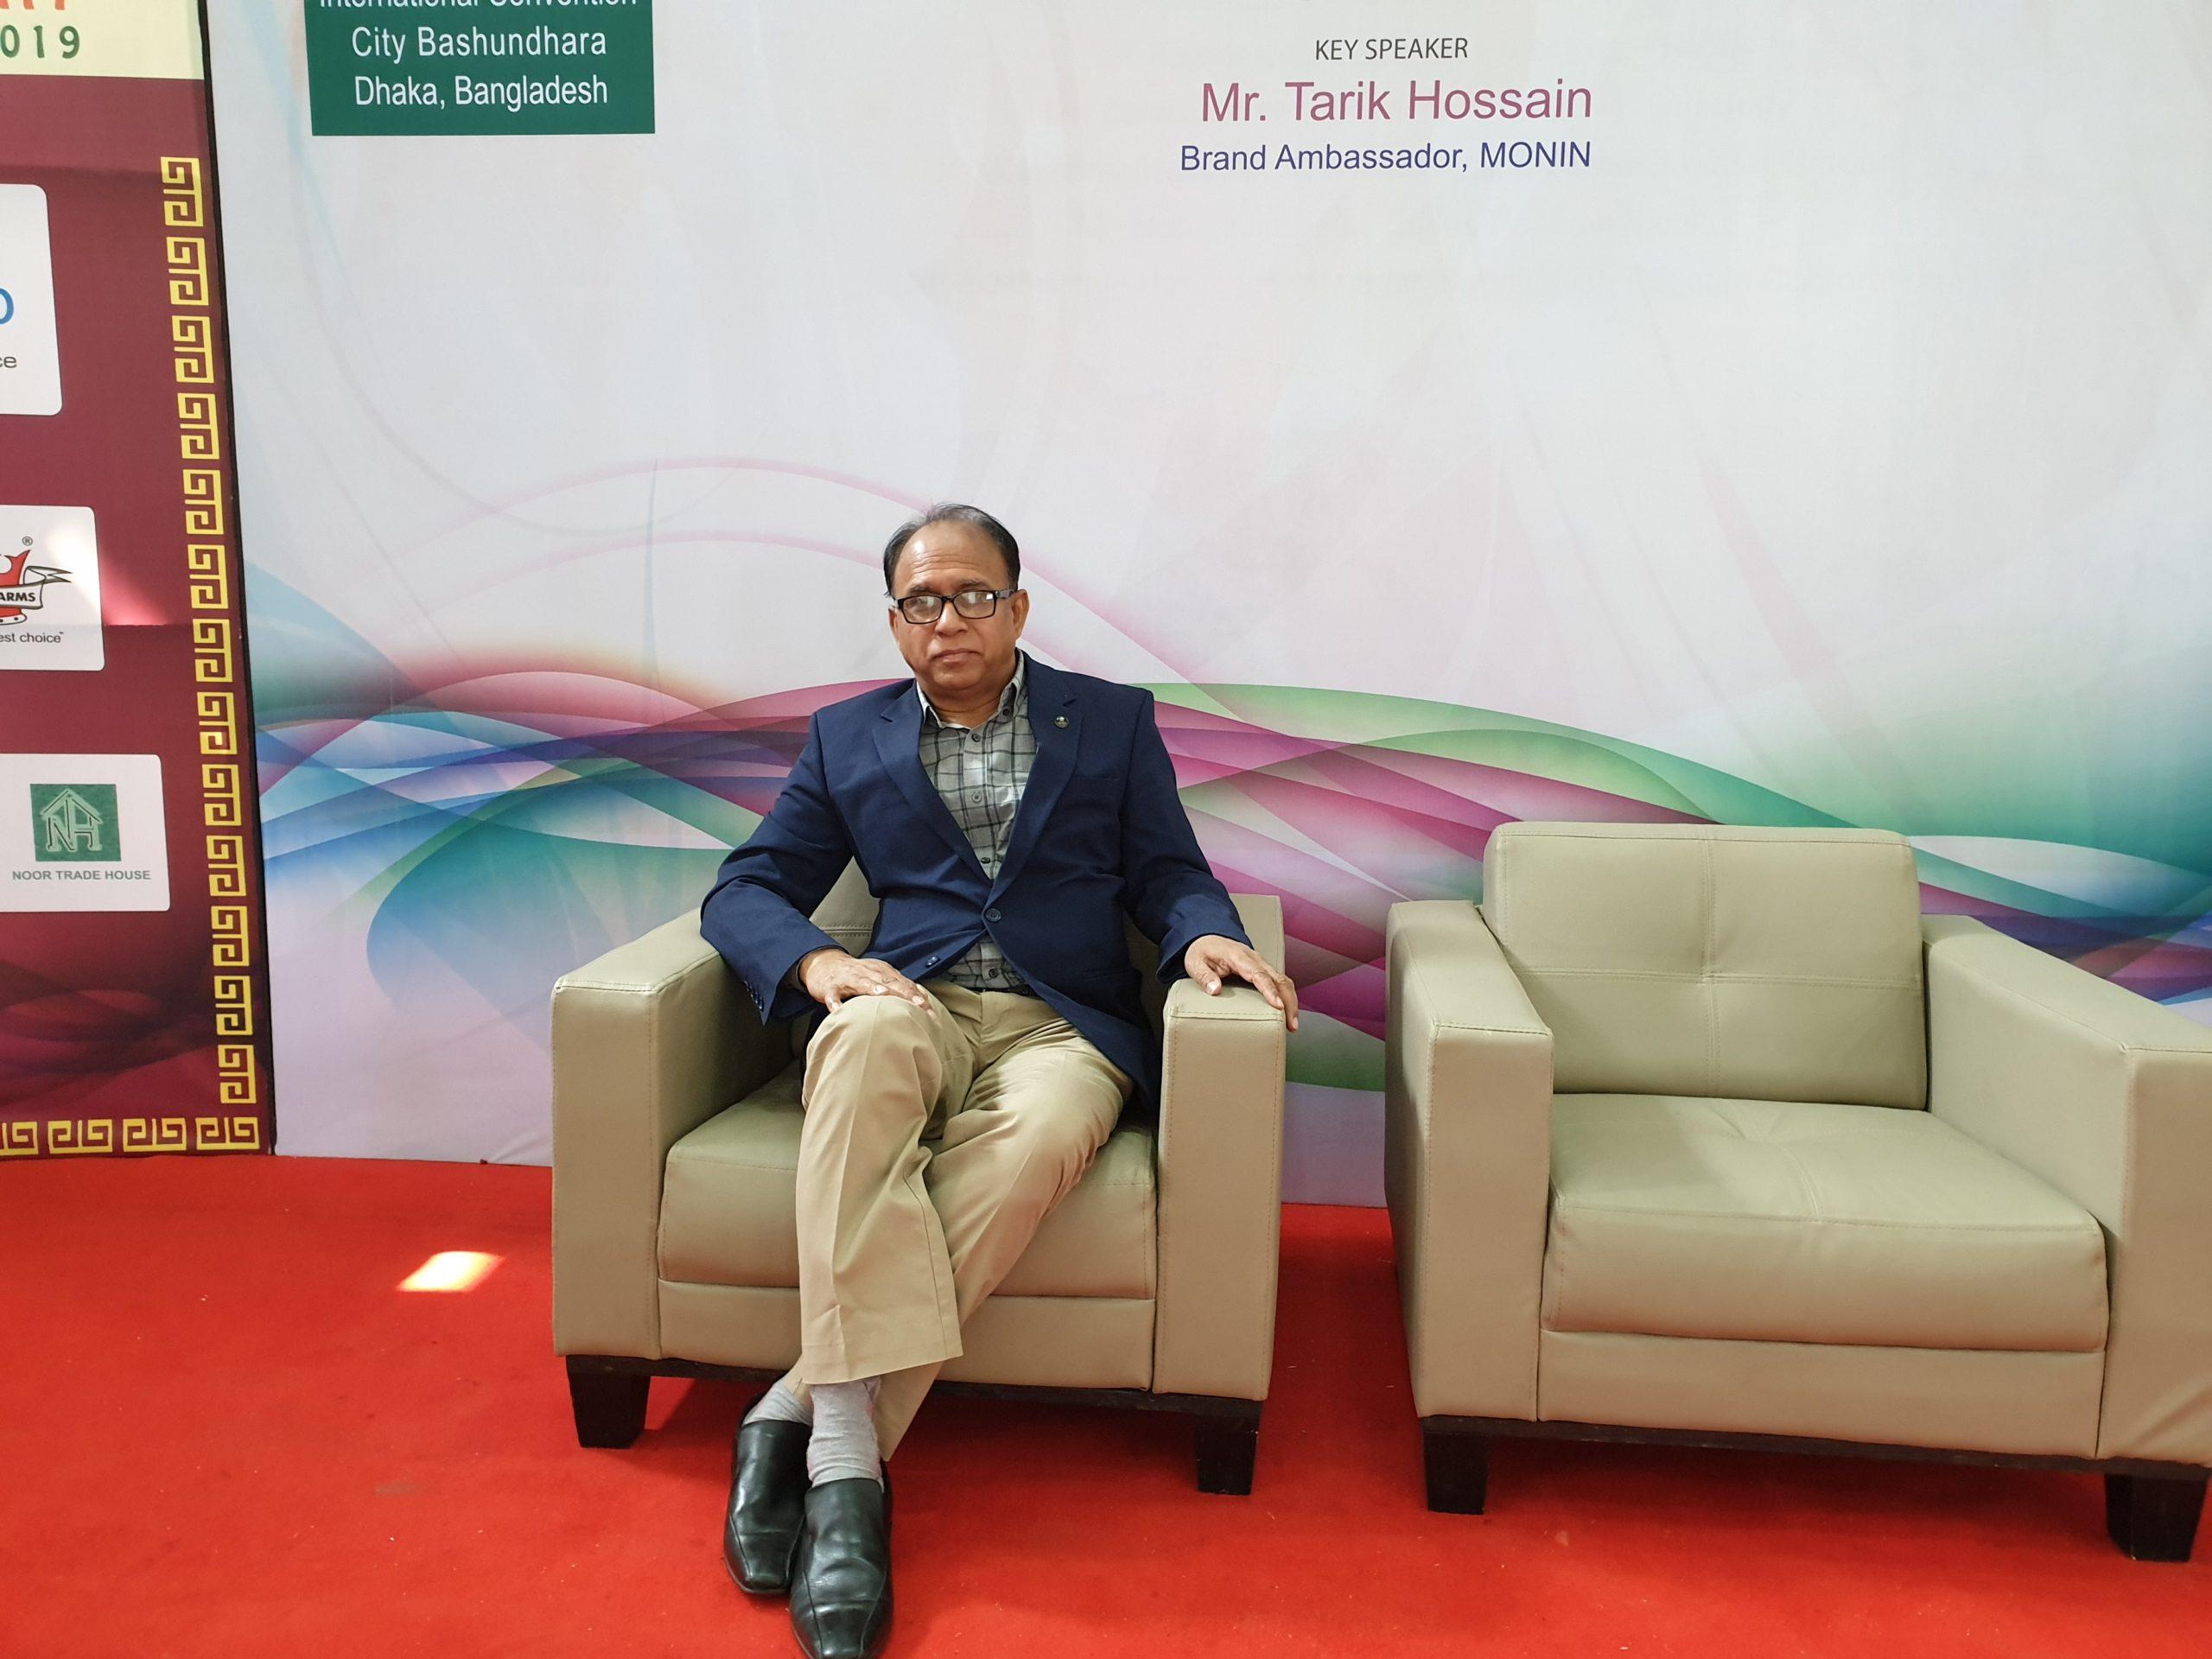 A.T.M. Ahmed Hossain, Dhaka Regency Hotel & Resort, Dhaka, Bangladesh